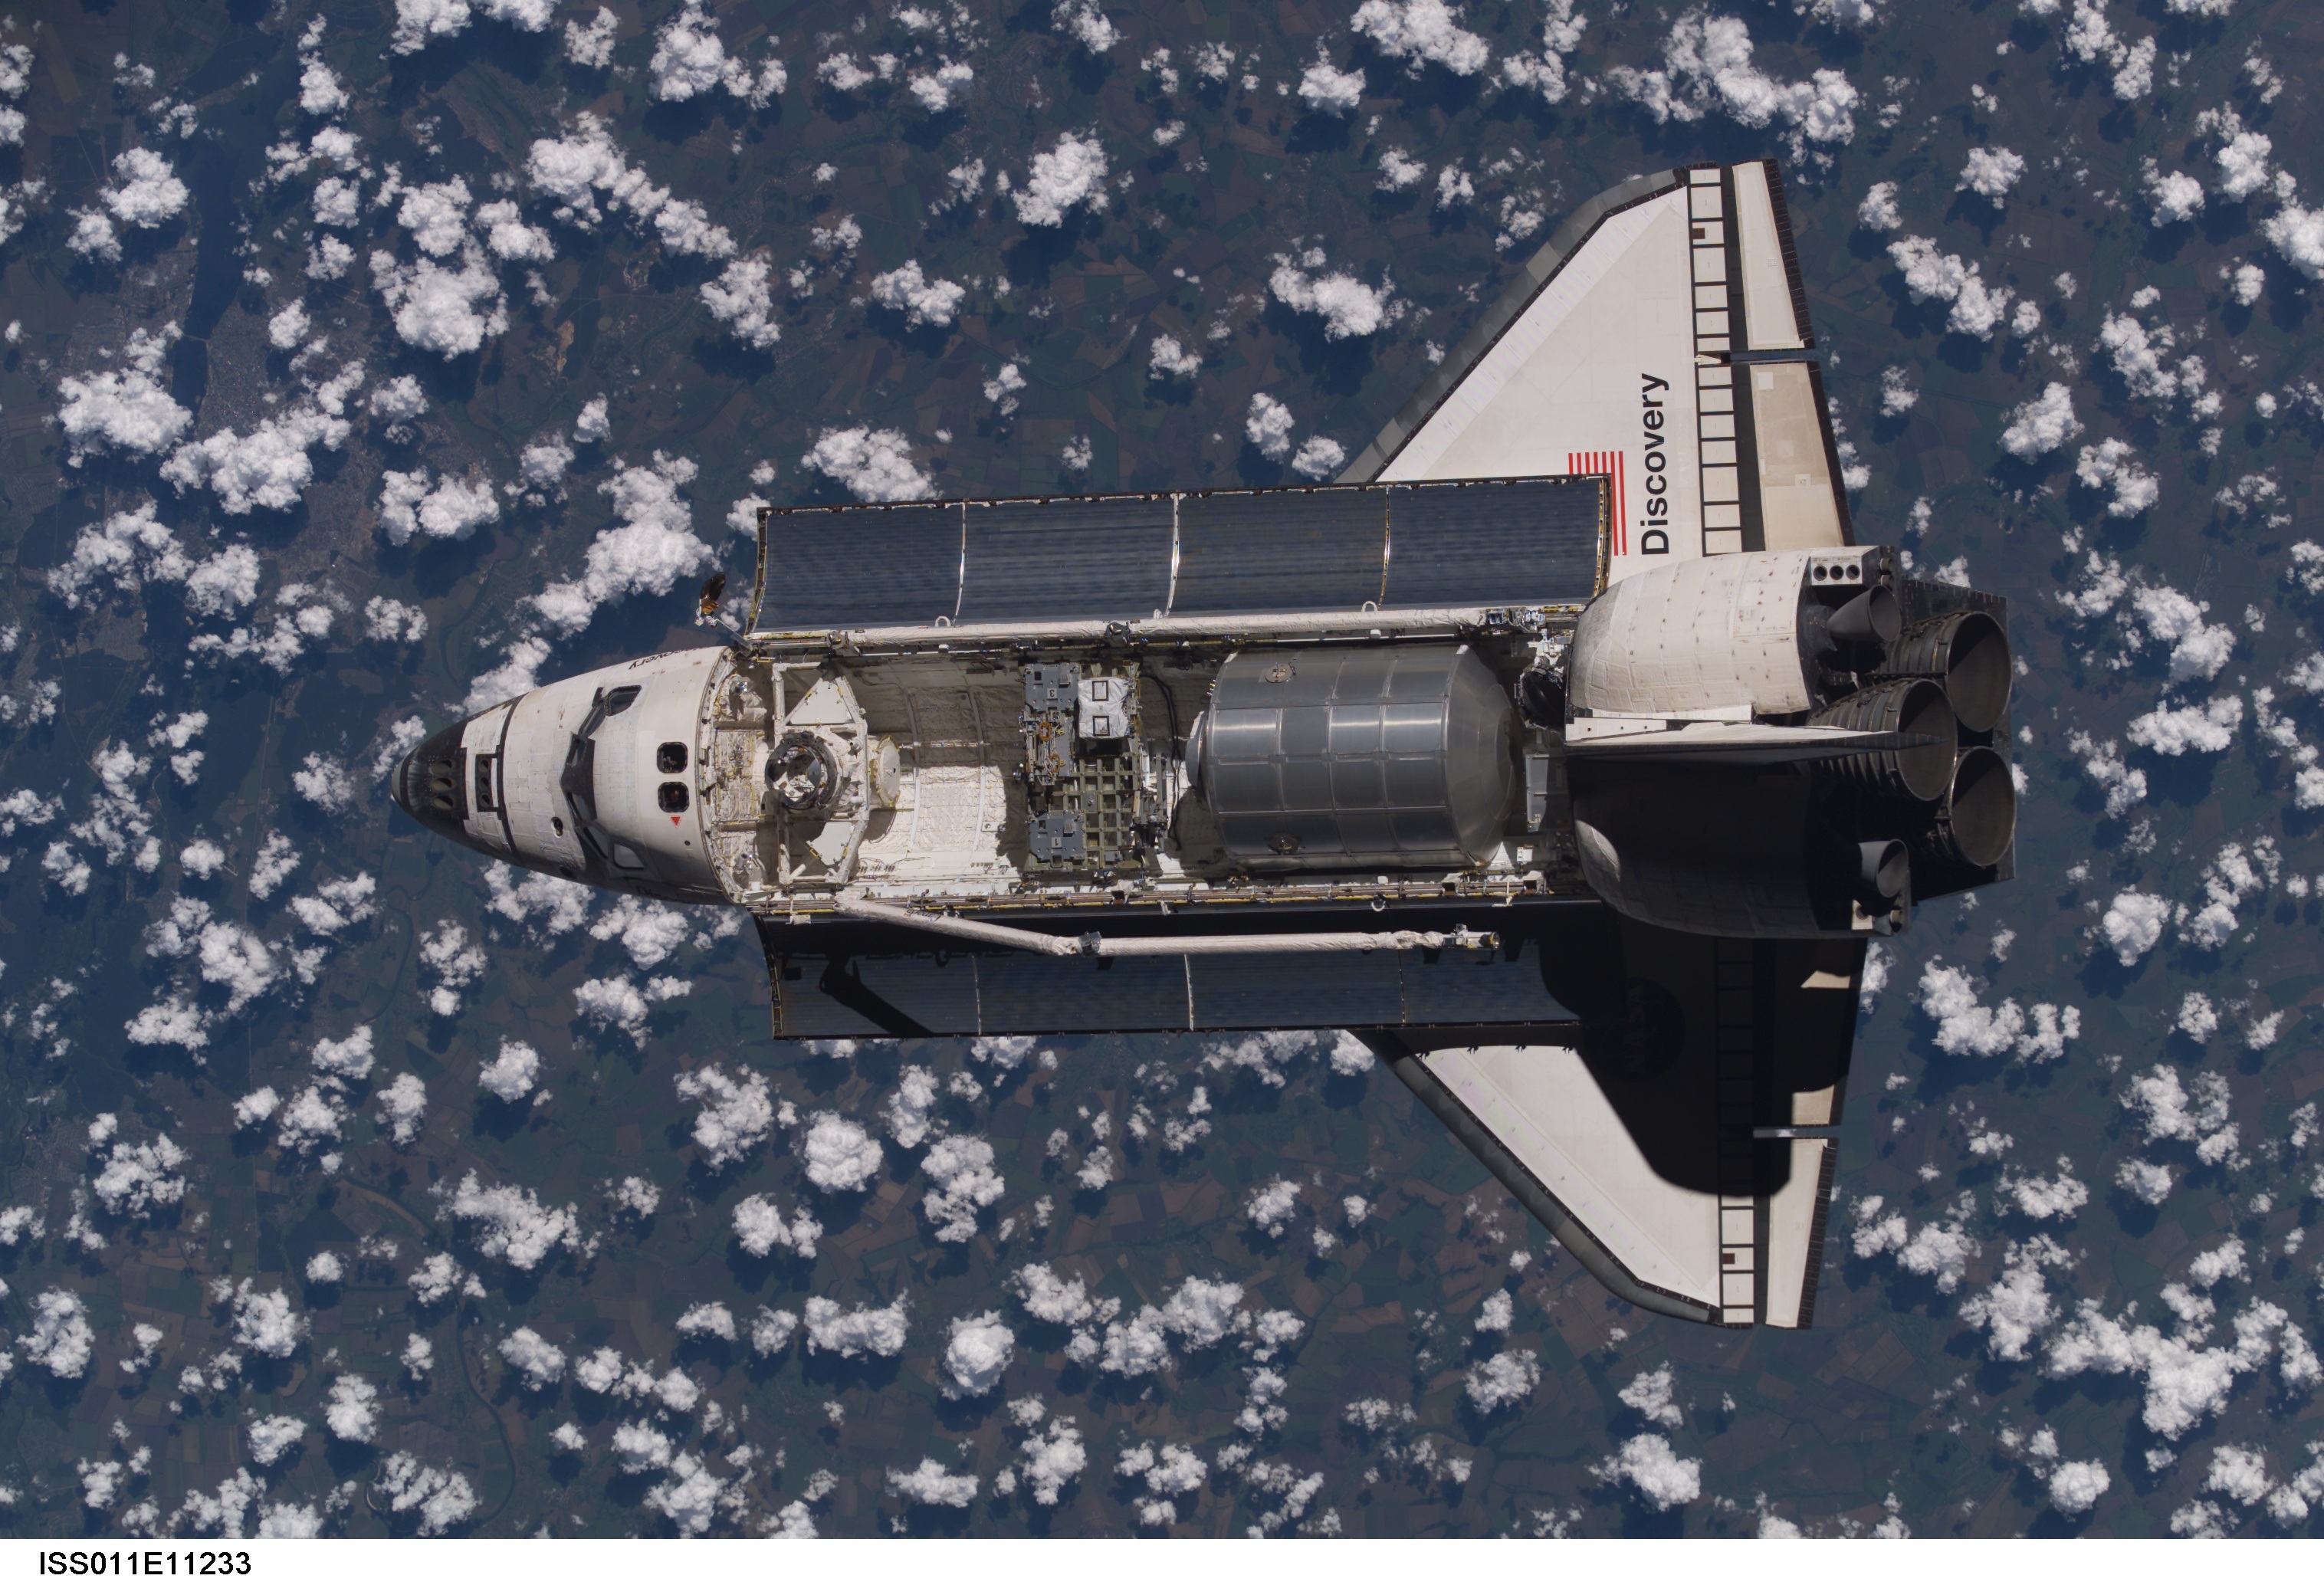 Space Shuttle, Liftoff, Nasa, Shuttle, Space, HQ Photo